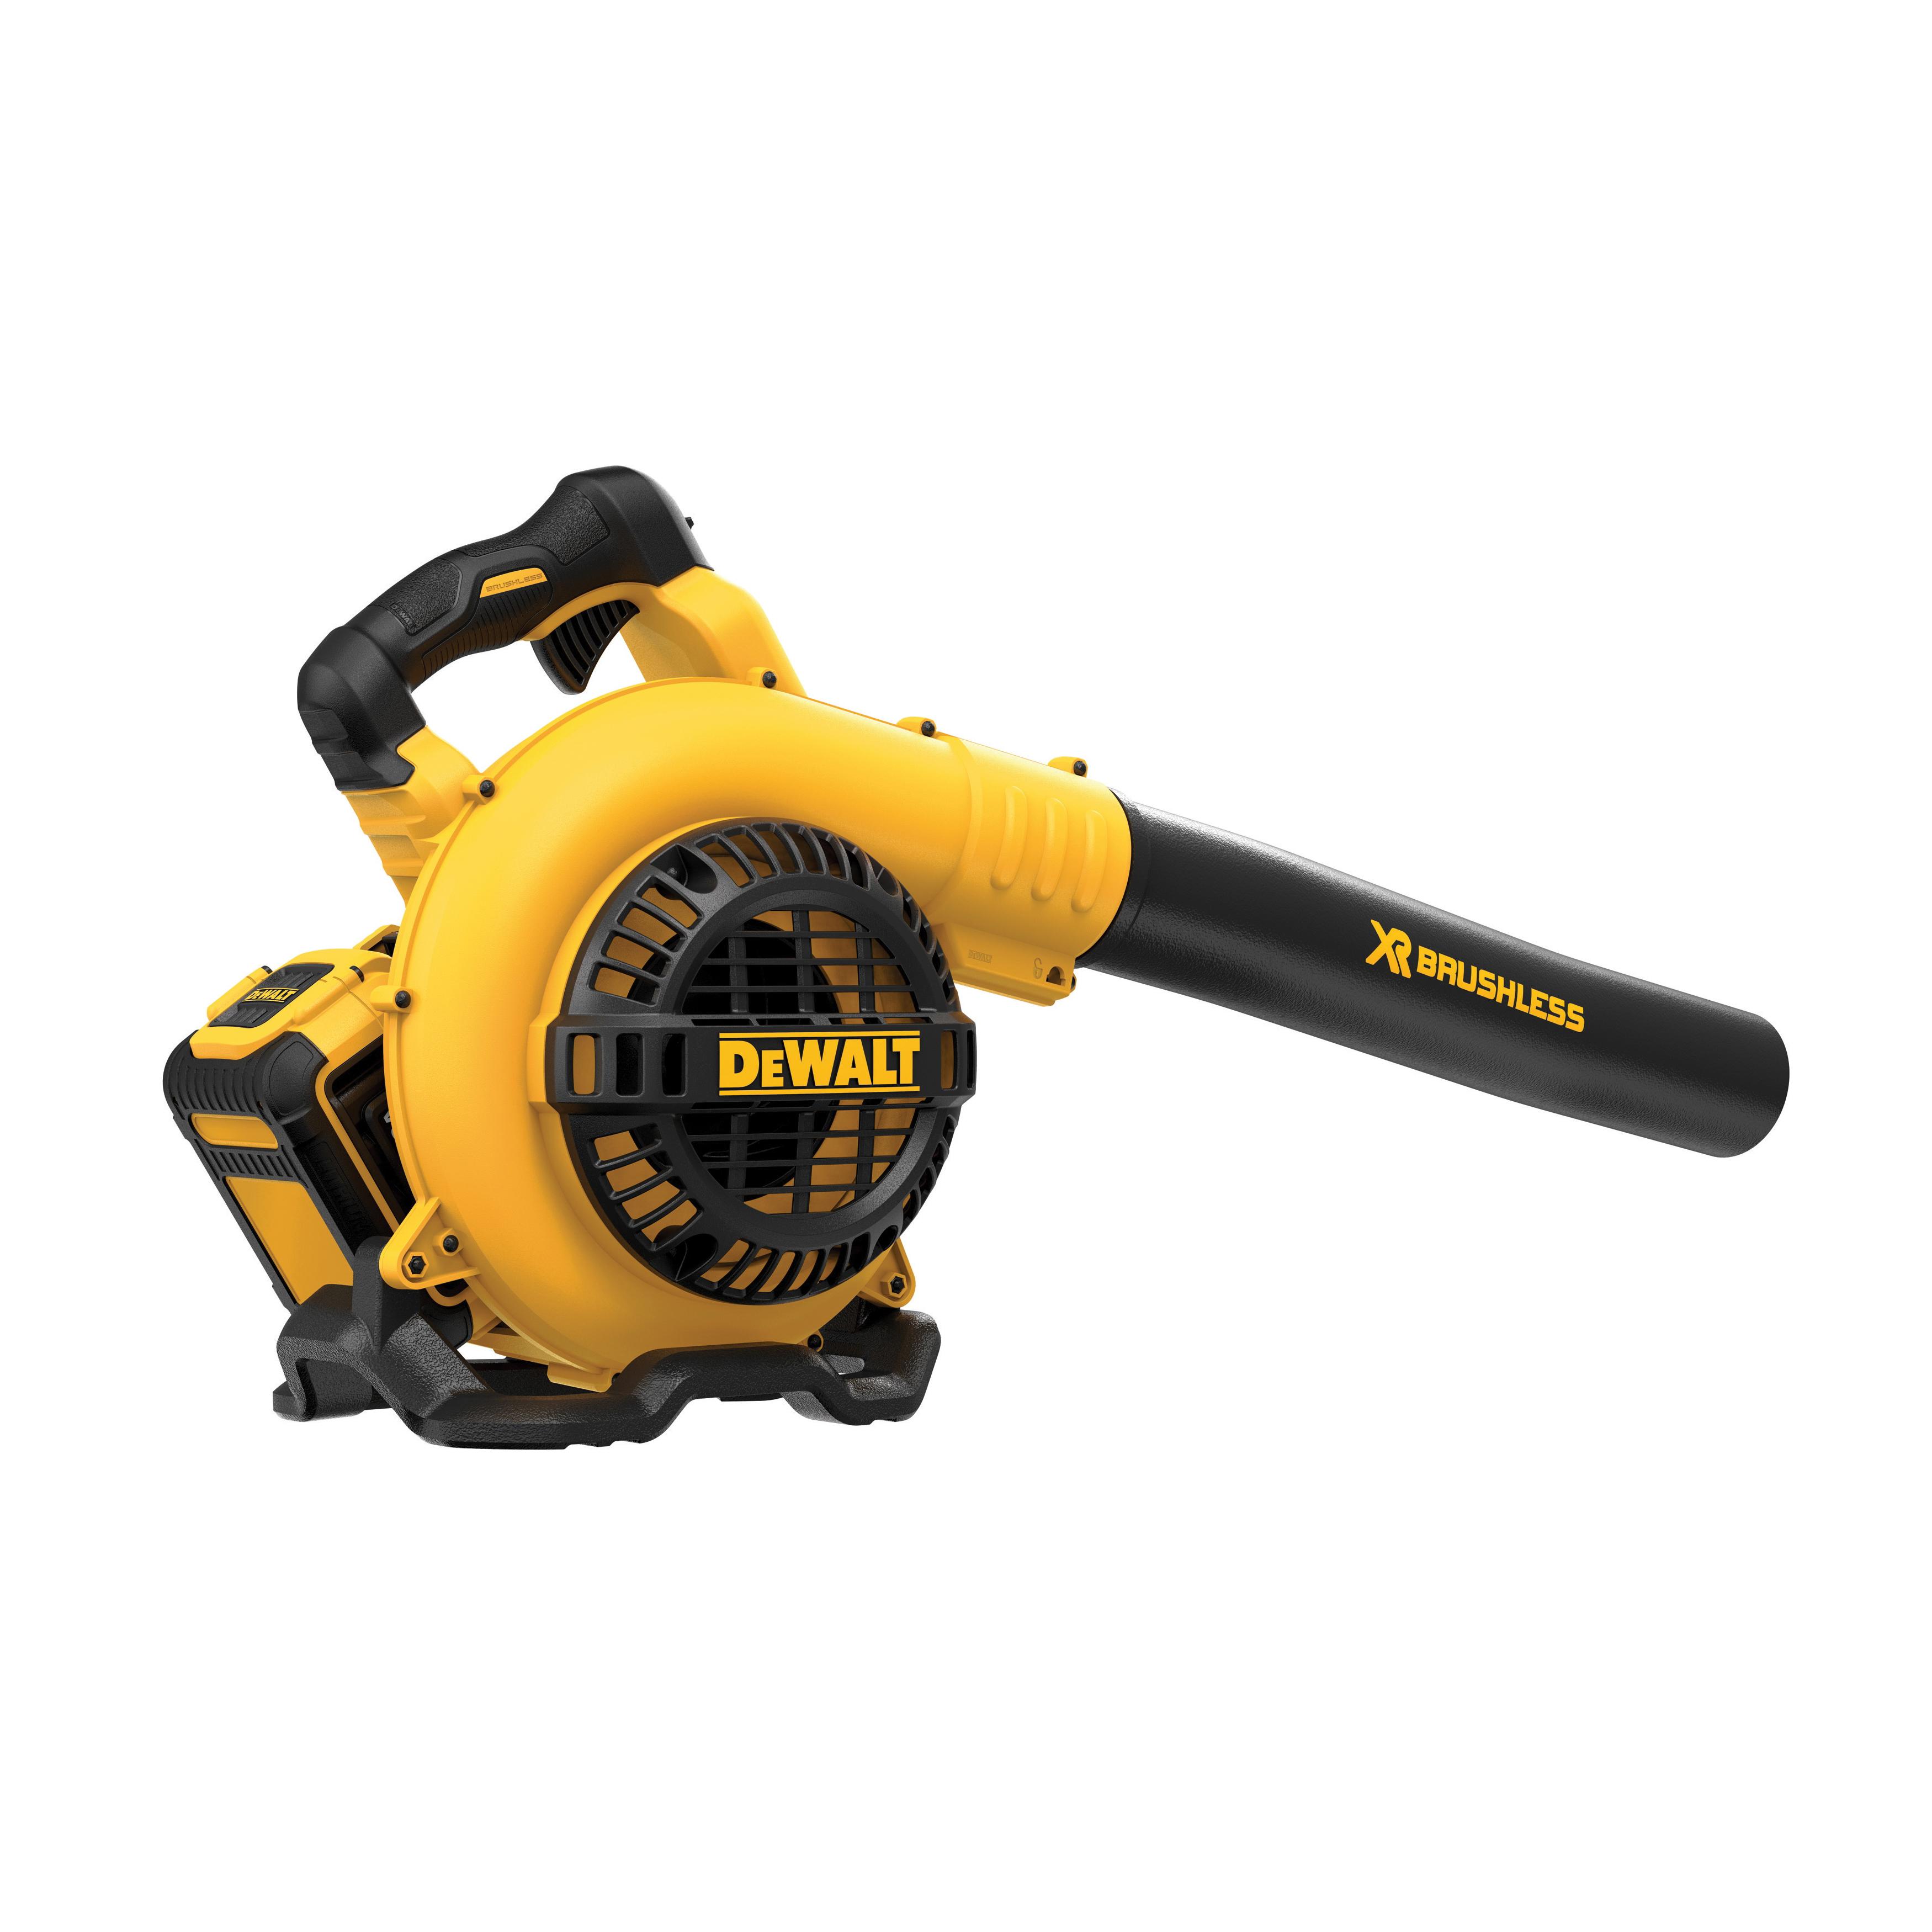 DeWALT® MAX XR® DCBL790H1 Brushless Handheld Lightweight Cordless Blower Kit, 400 cfm Air Flow, 120 mph Air Velocity, 40 V 6 Ah Lithium-Ion Battery